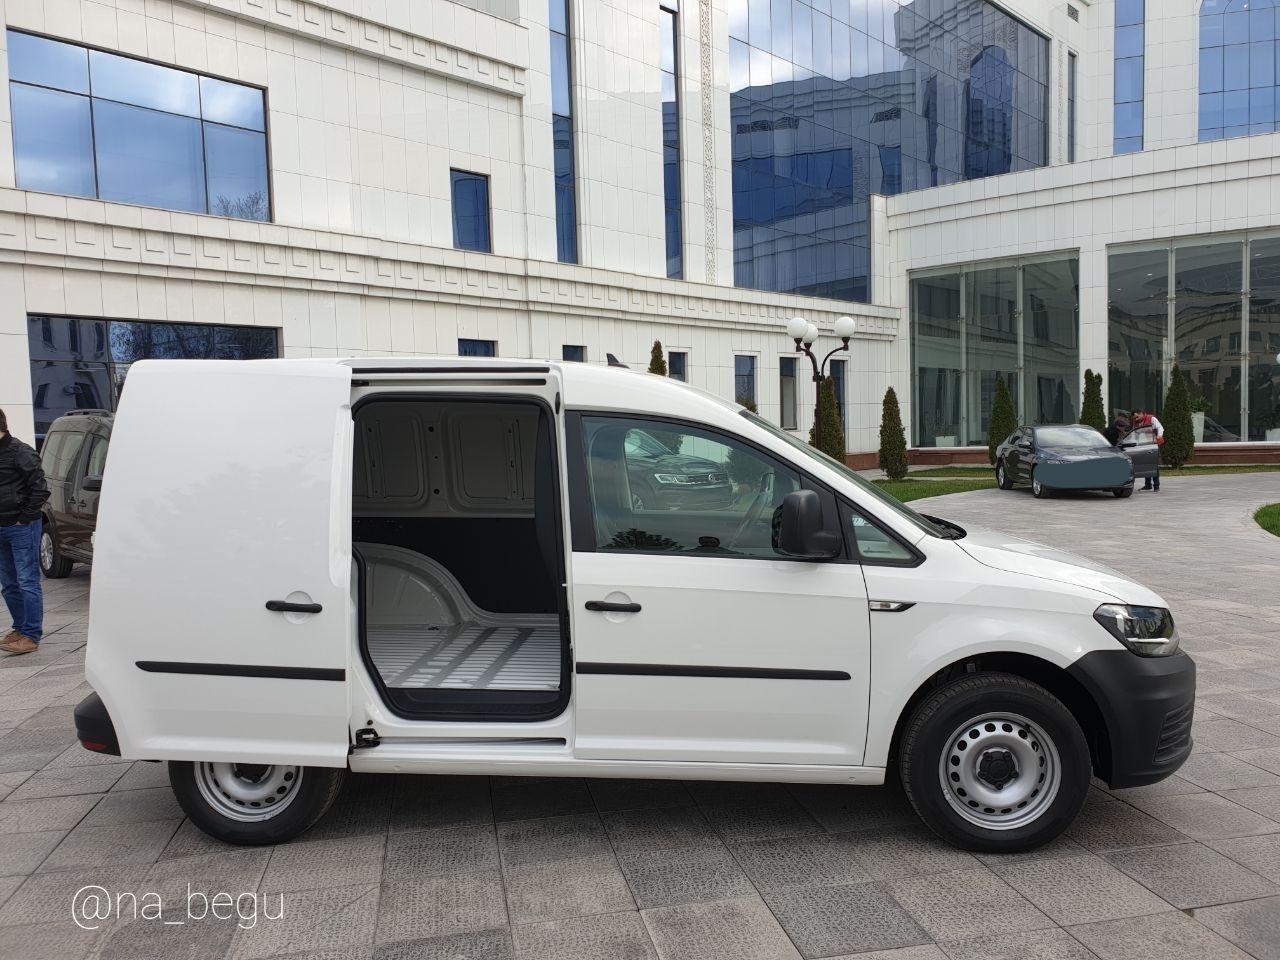 Volkswagen Caddy Narxi - Цена на Кэдди в Узбекистане - 6